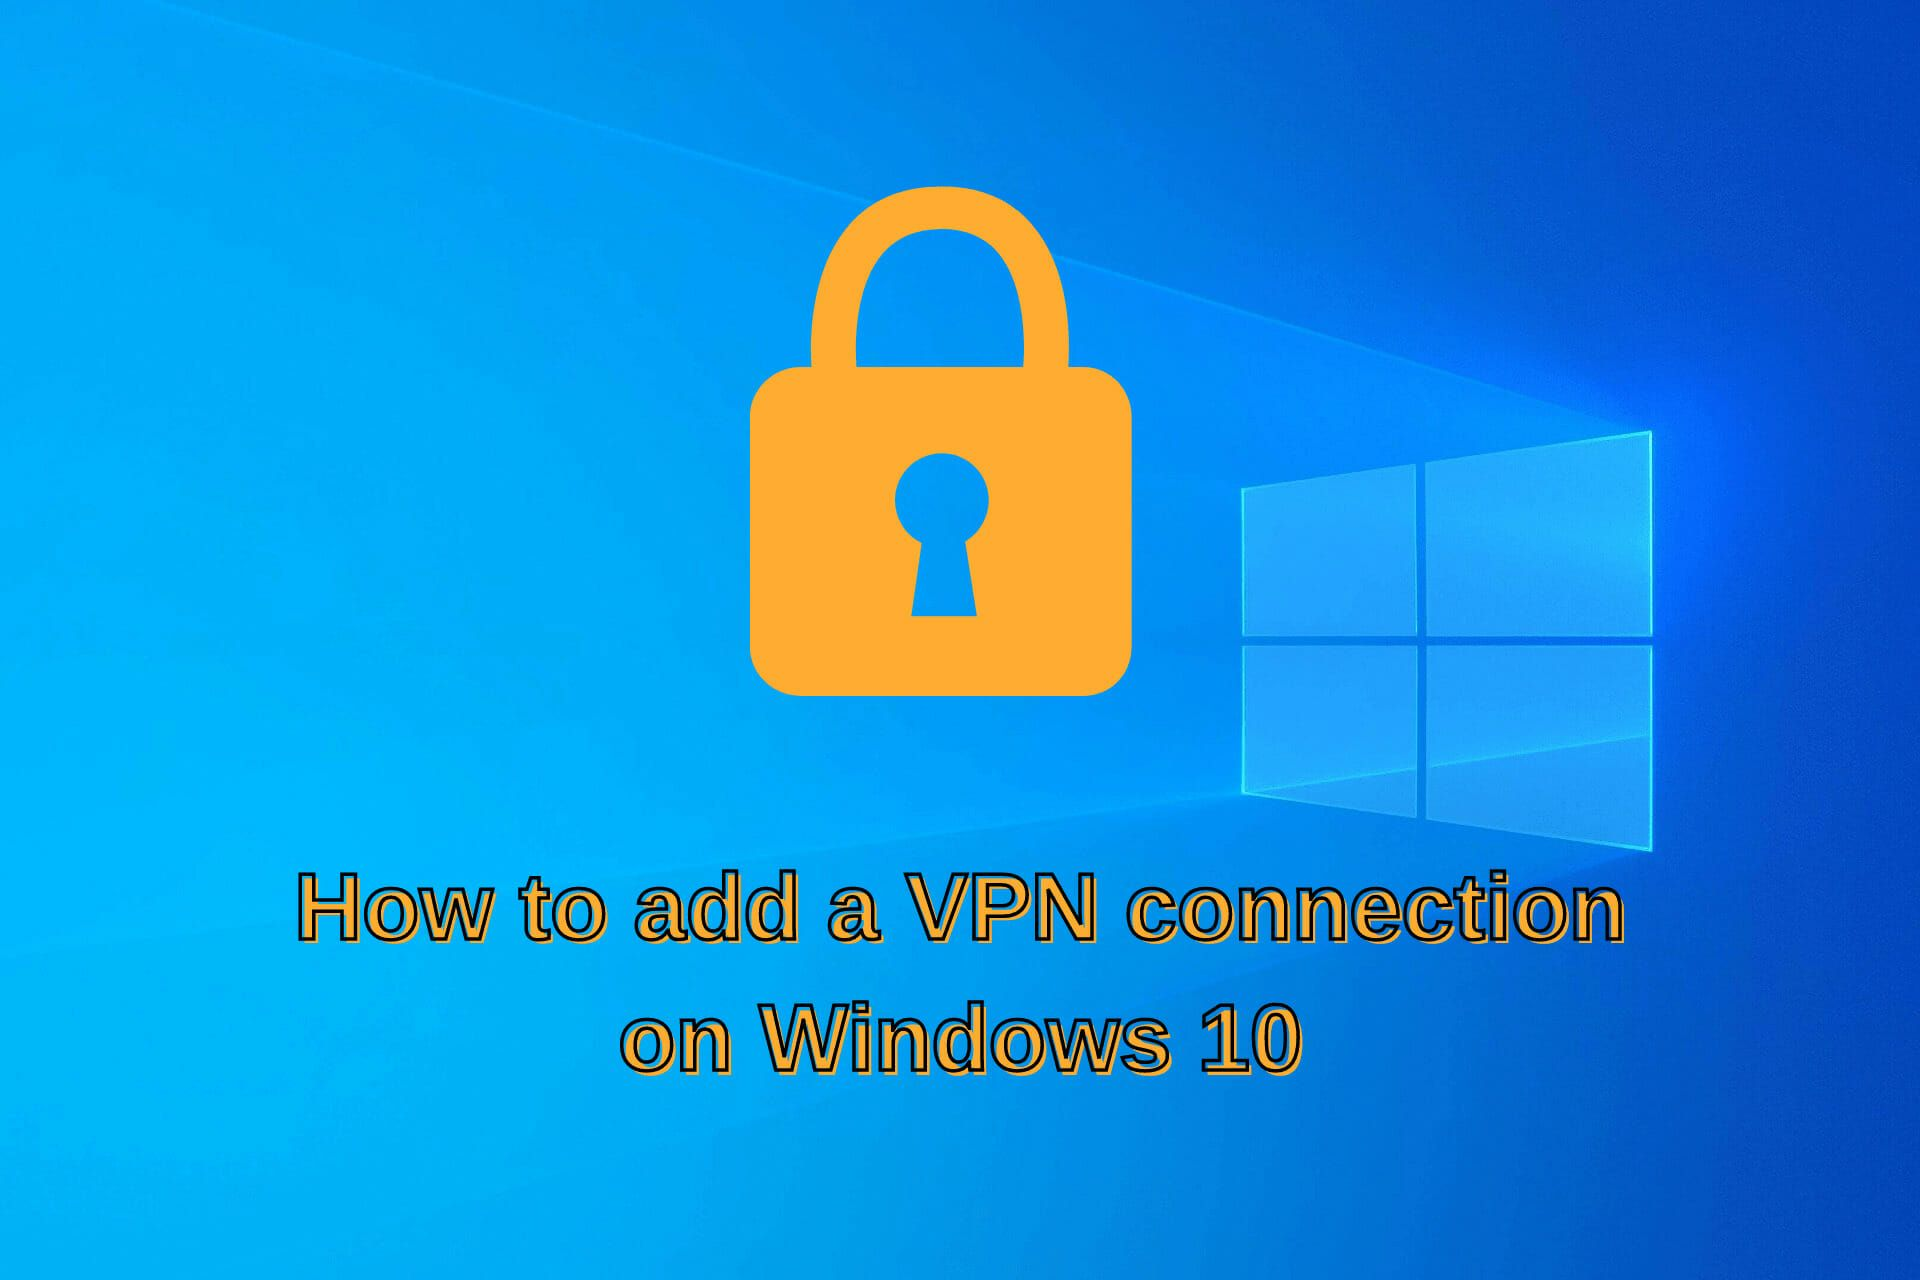 3e04e048e76ad9e0e15792b06373d50a - How To Connect To Vpn On Windows